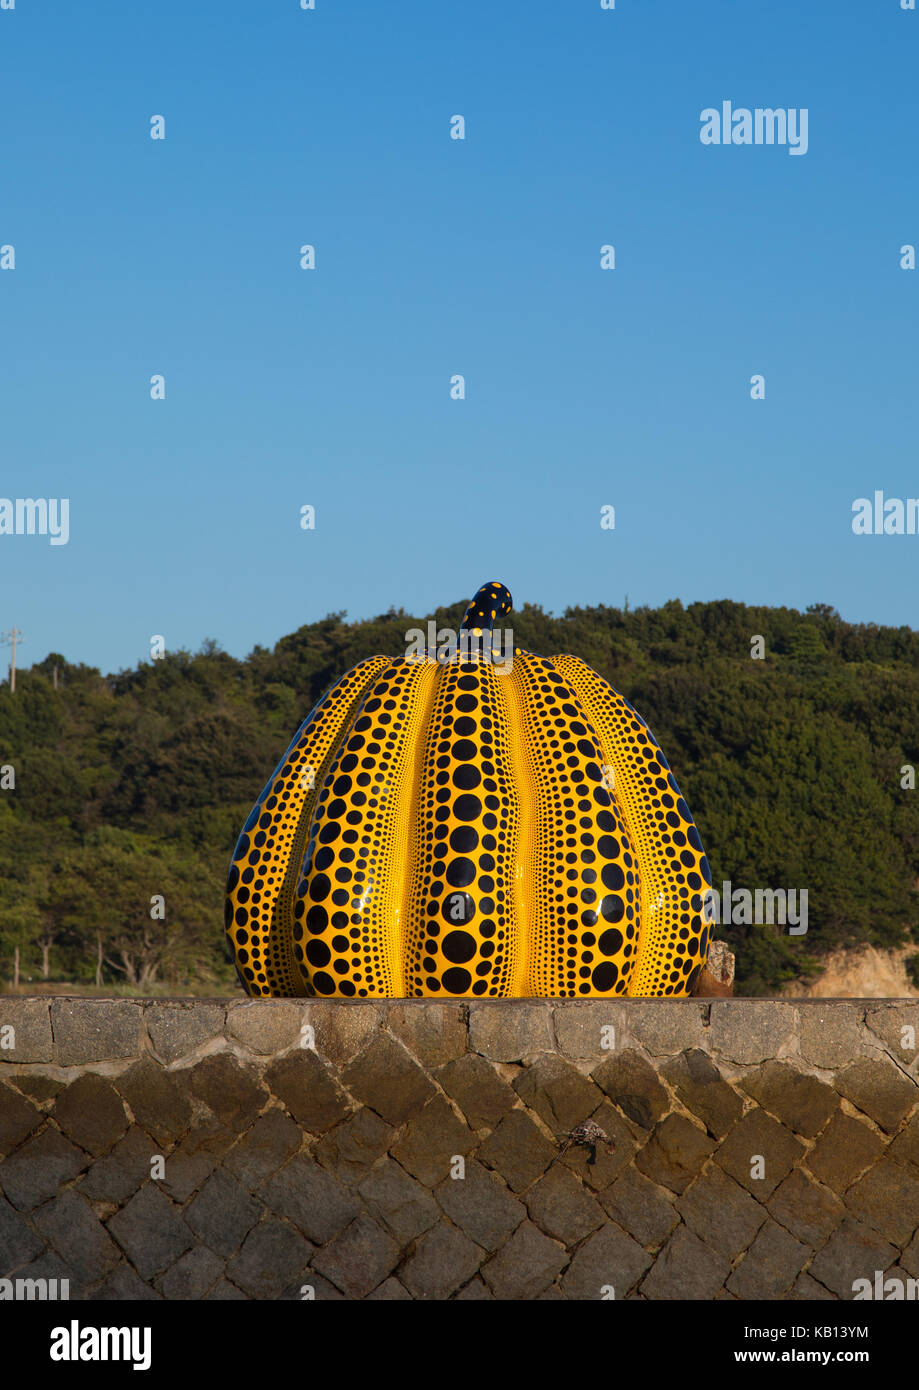 Yellow pumpkin by yayoi kusama on pier at sea, Seto Inland Sea, Naoshima, Japan - Stock Image